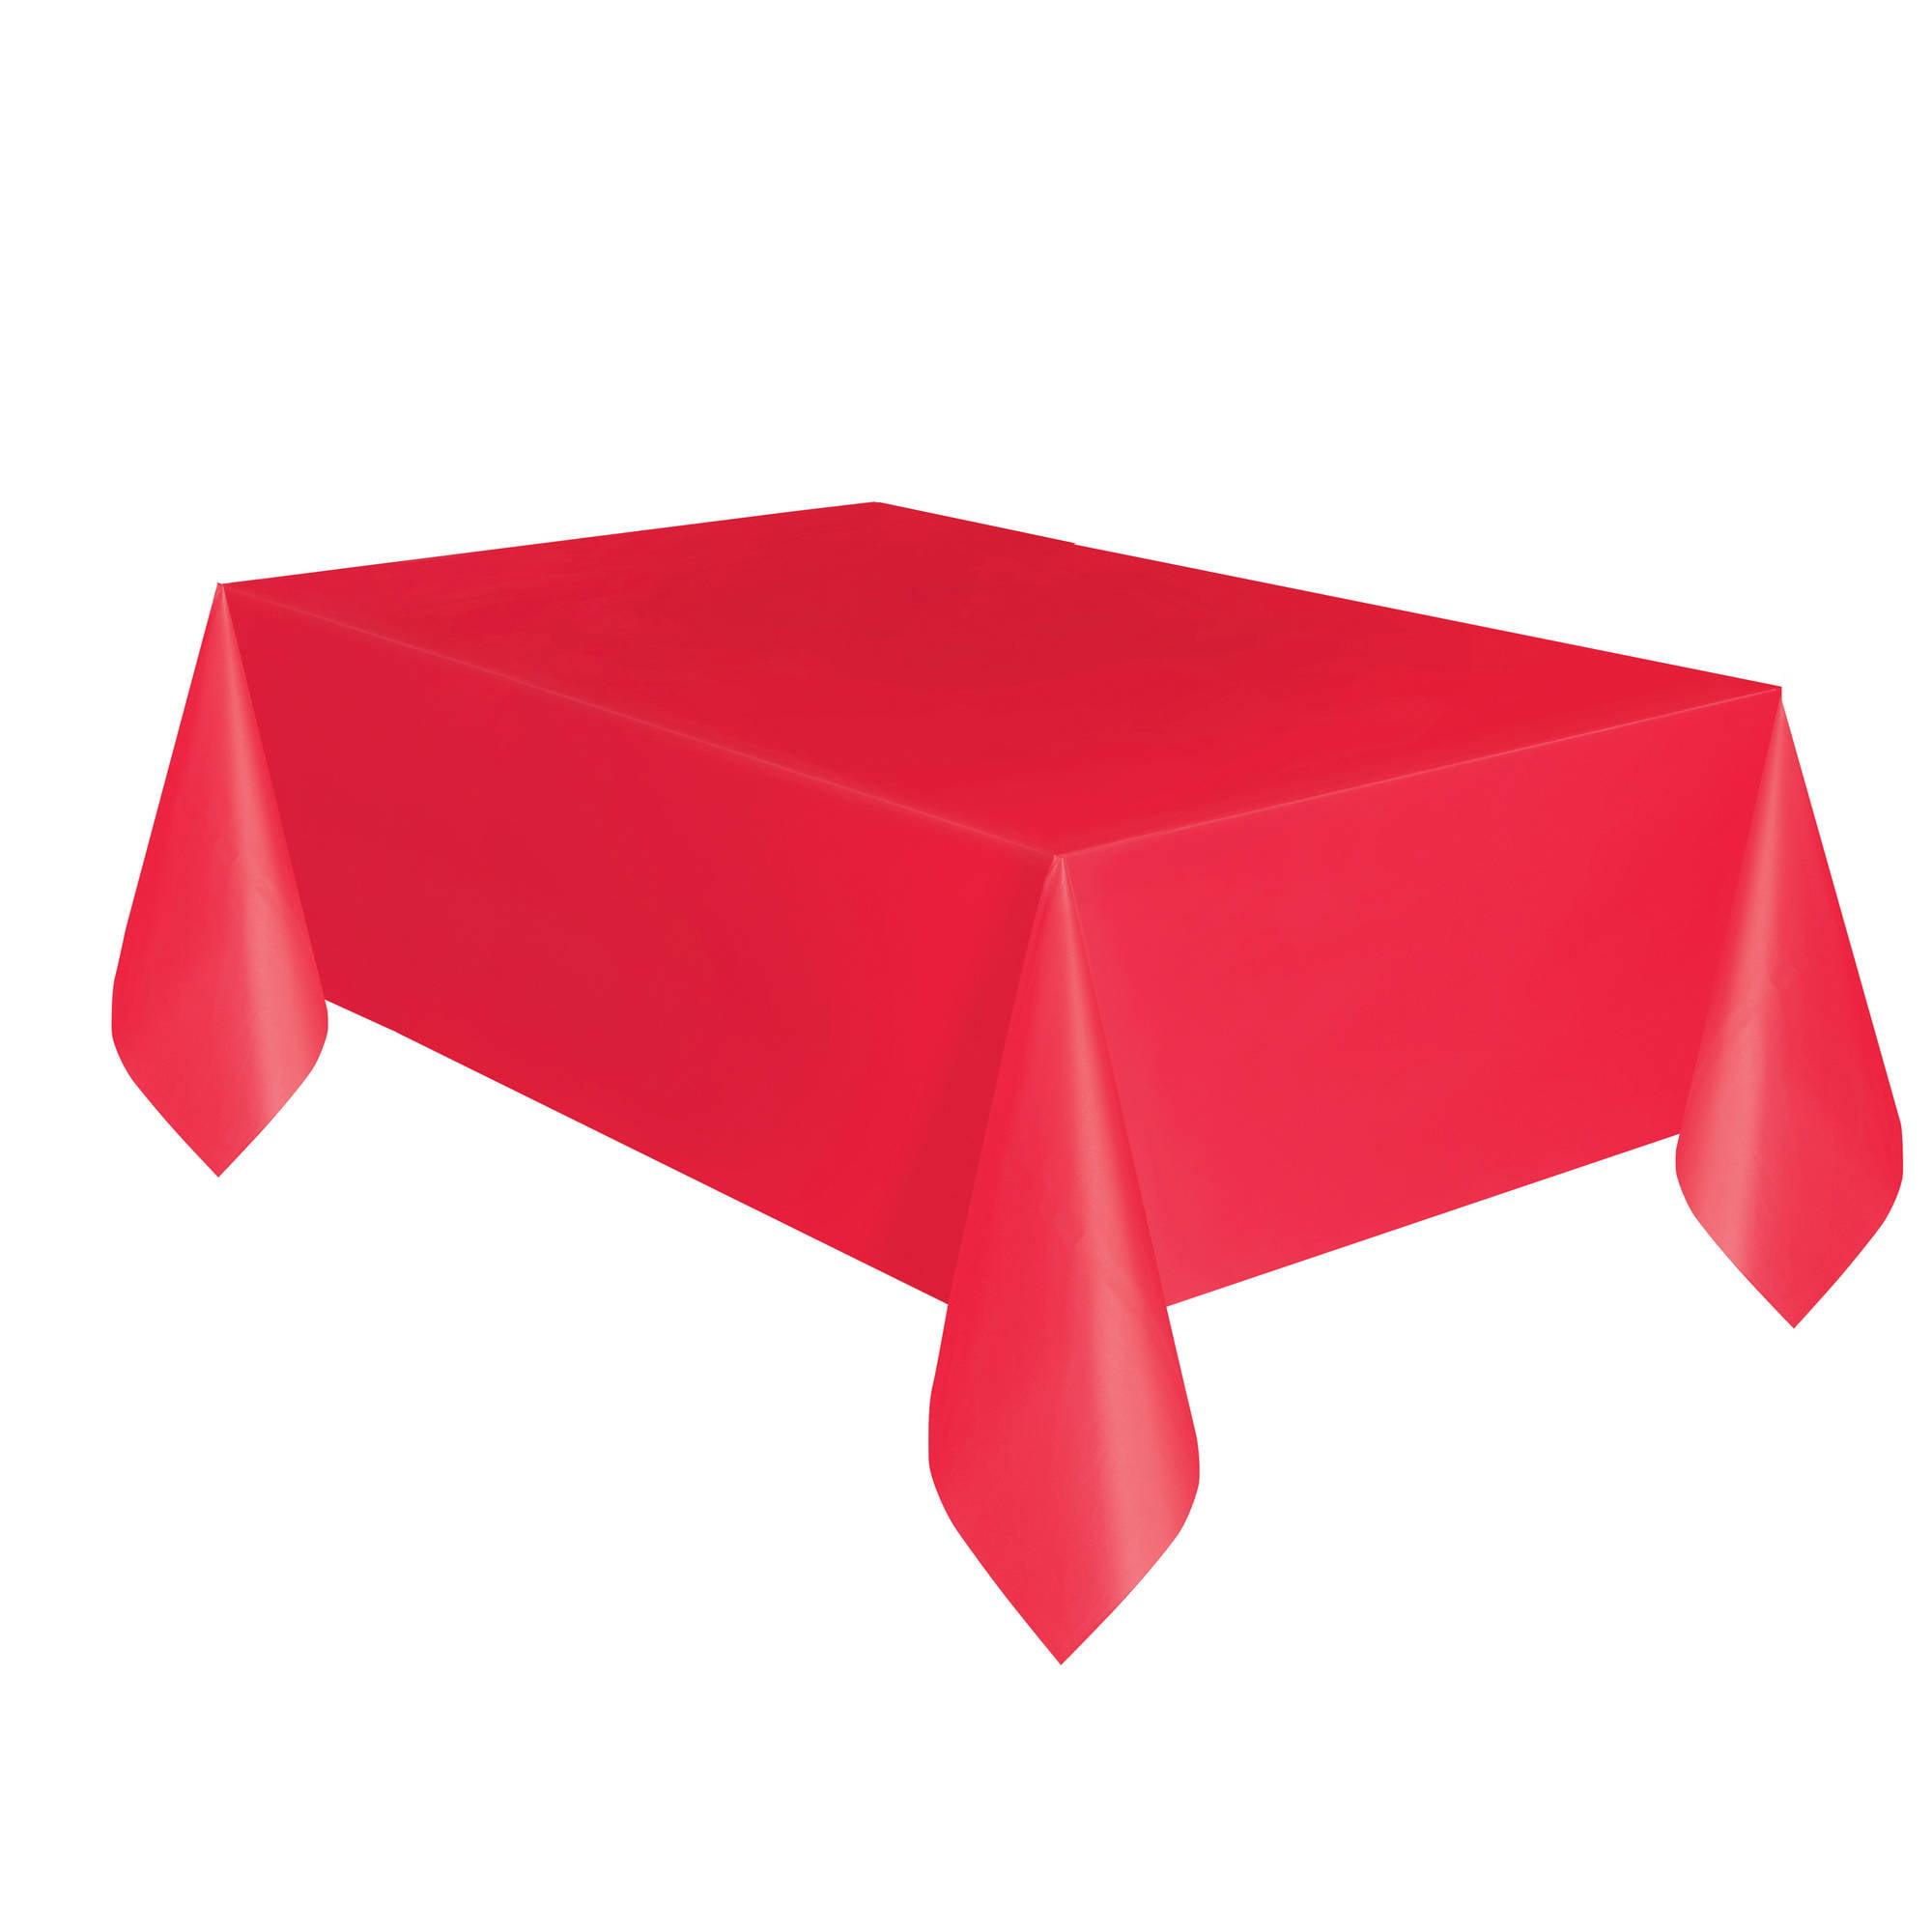 Unique Red Plastic Tablecloth 108 X 54 In 2ct Walmart Com